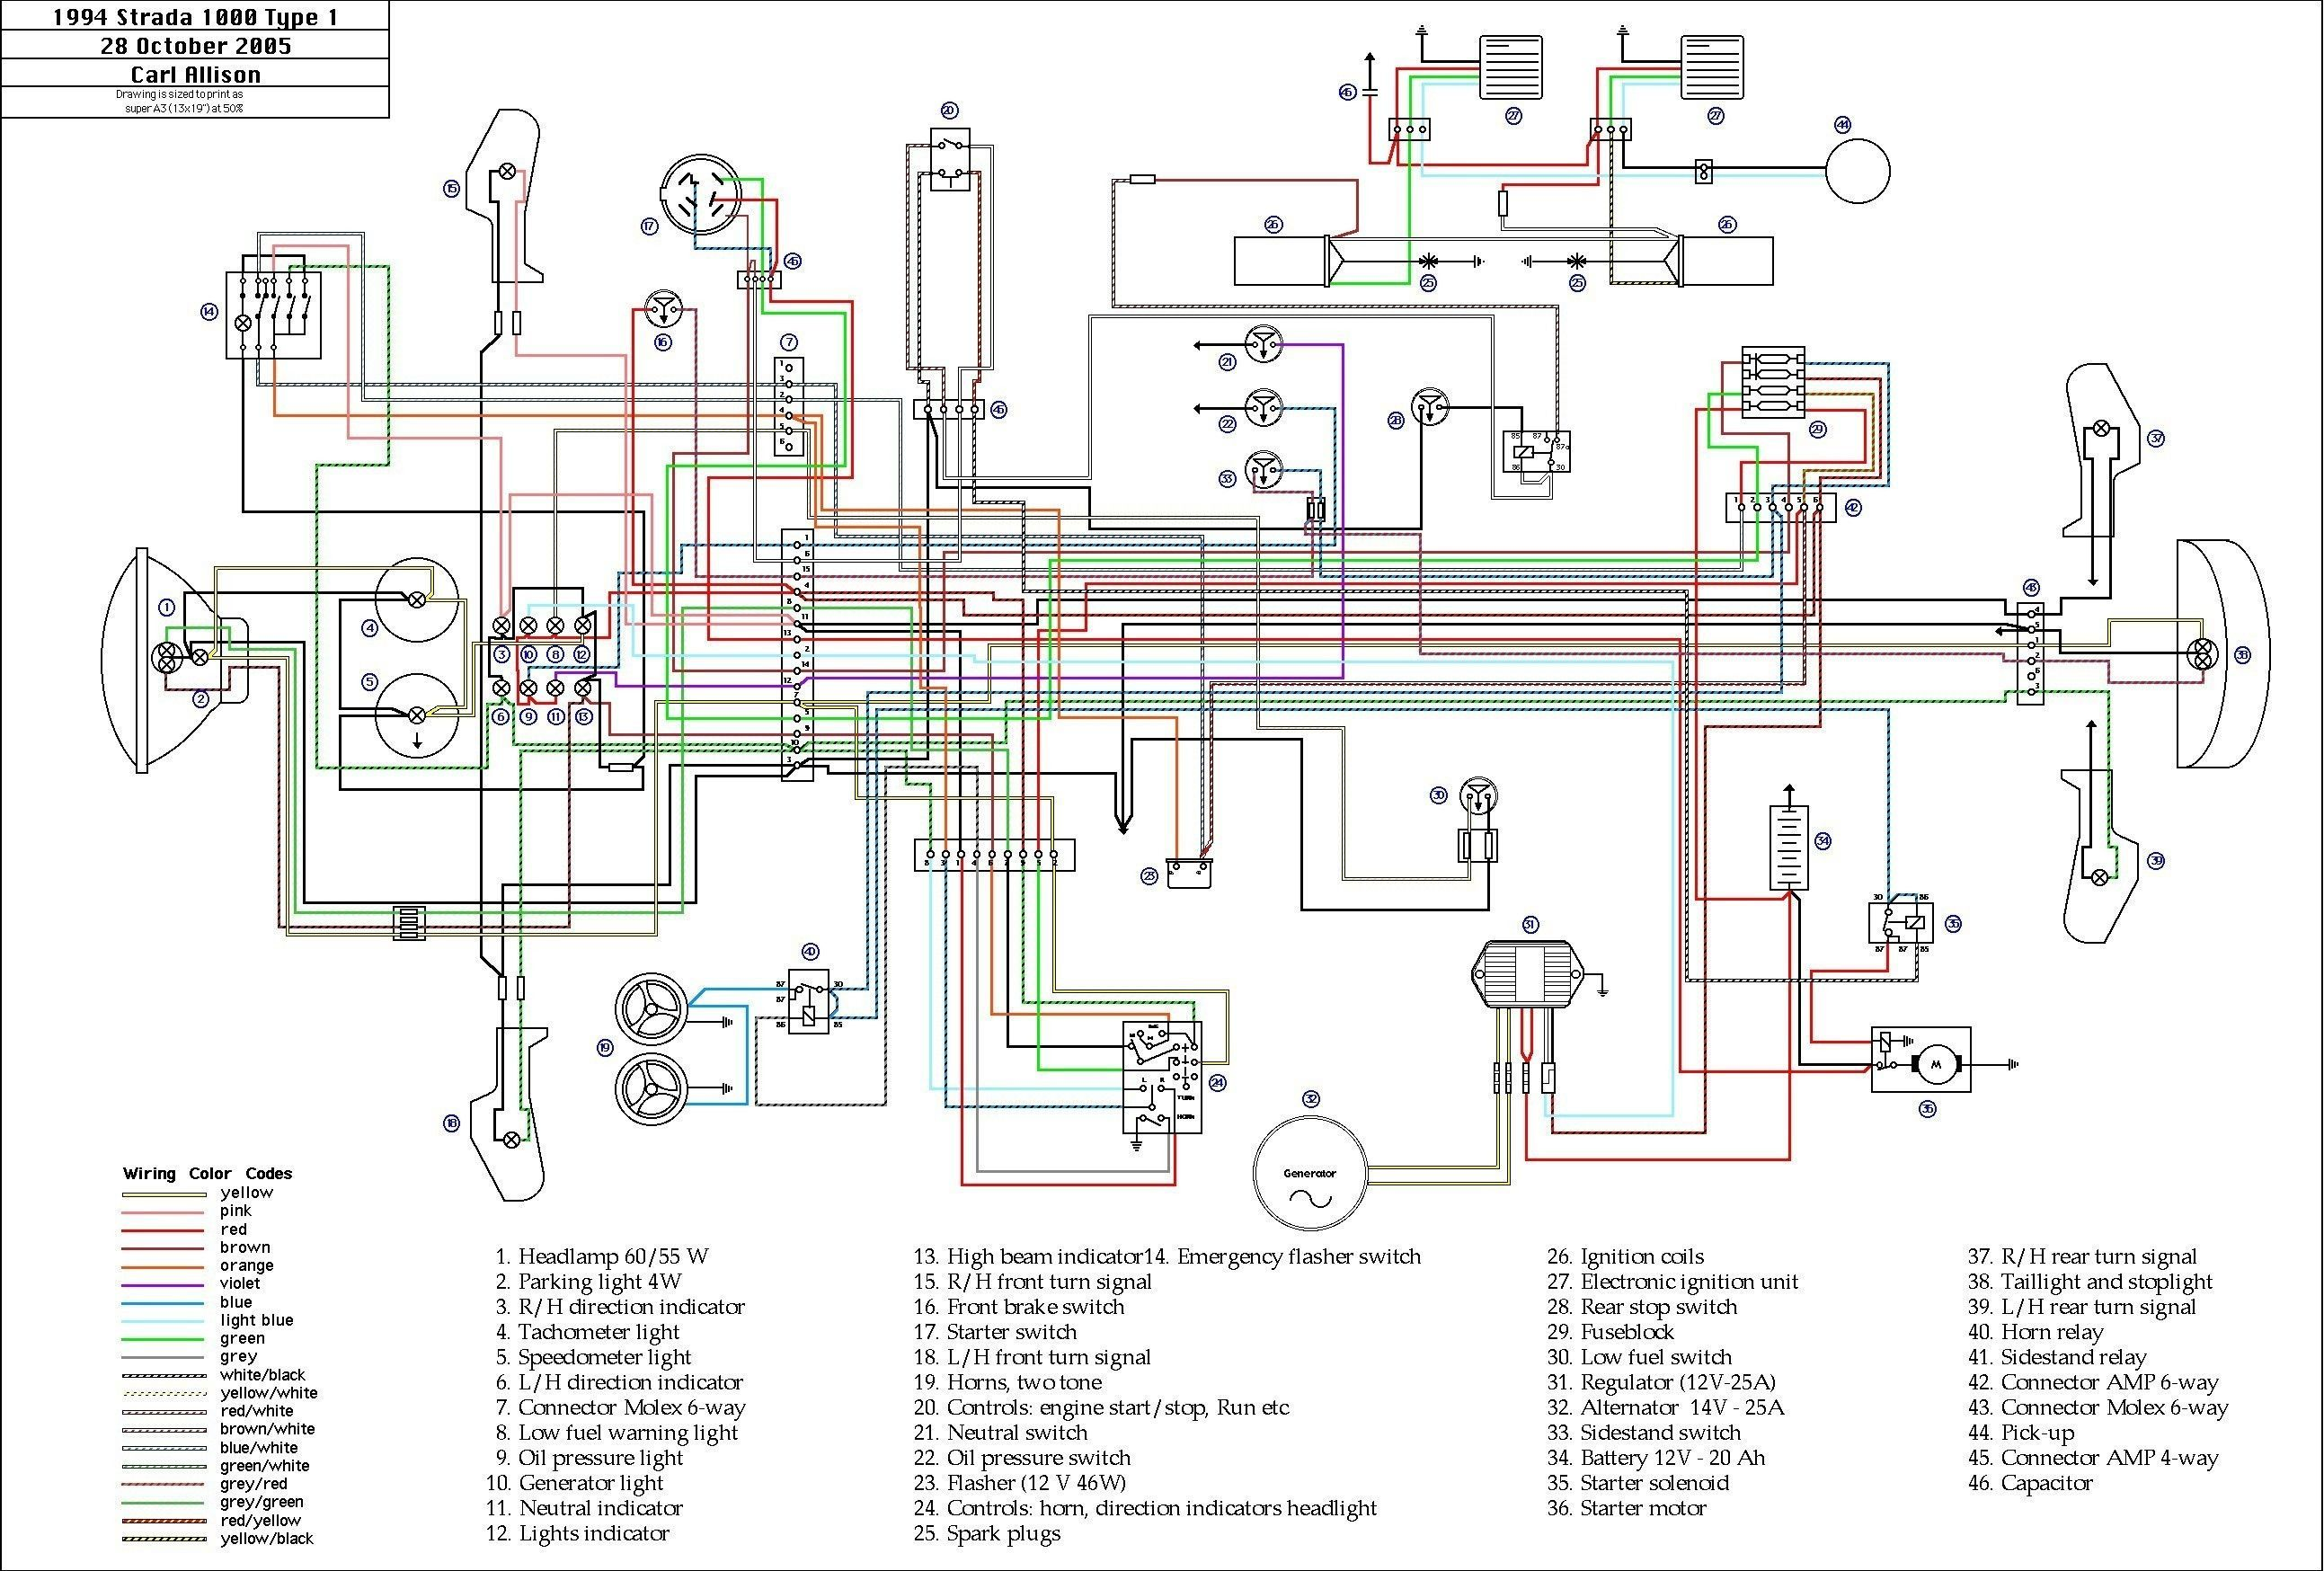 Diagramtemplate Diagramformats Diagramsample Cluster Diagram Wiring New Bmw Enew Bmw E46 Cluster Wiring Diagram Opel Corsa Trailer Wiring Diagram Opel